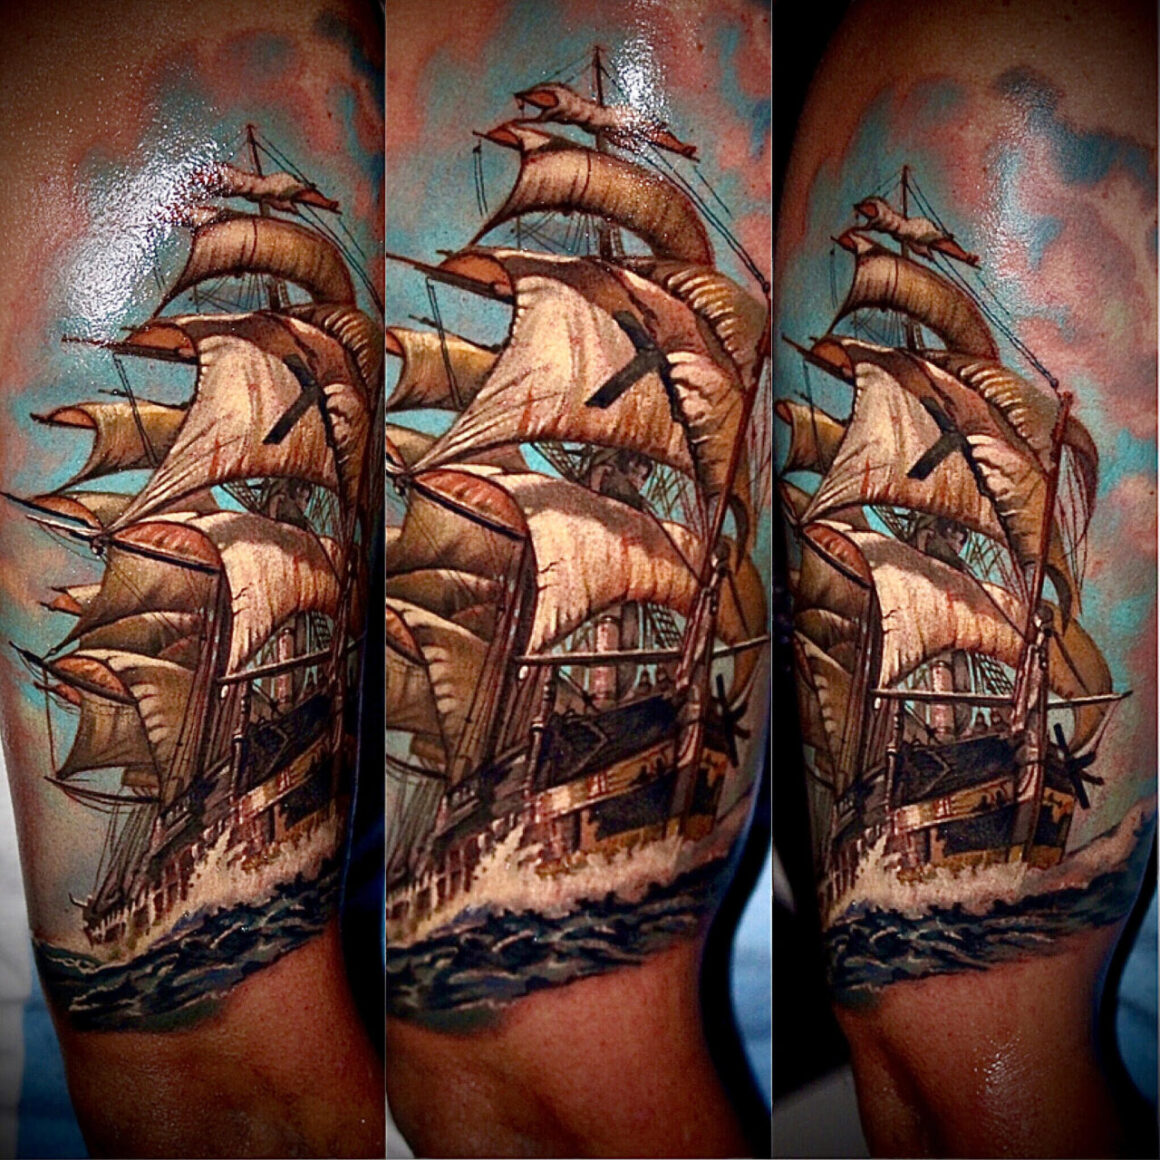 Damien Wickham, Ink Attack & The Black List Tattoo Sunshine Coast Australia, Las Vegas